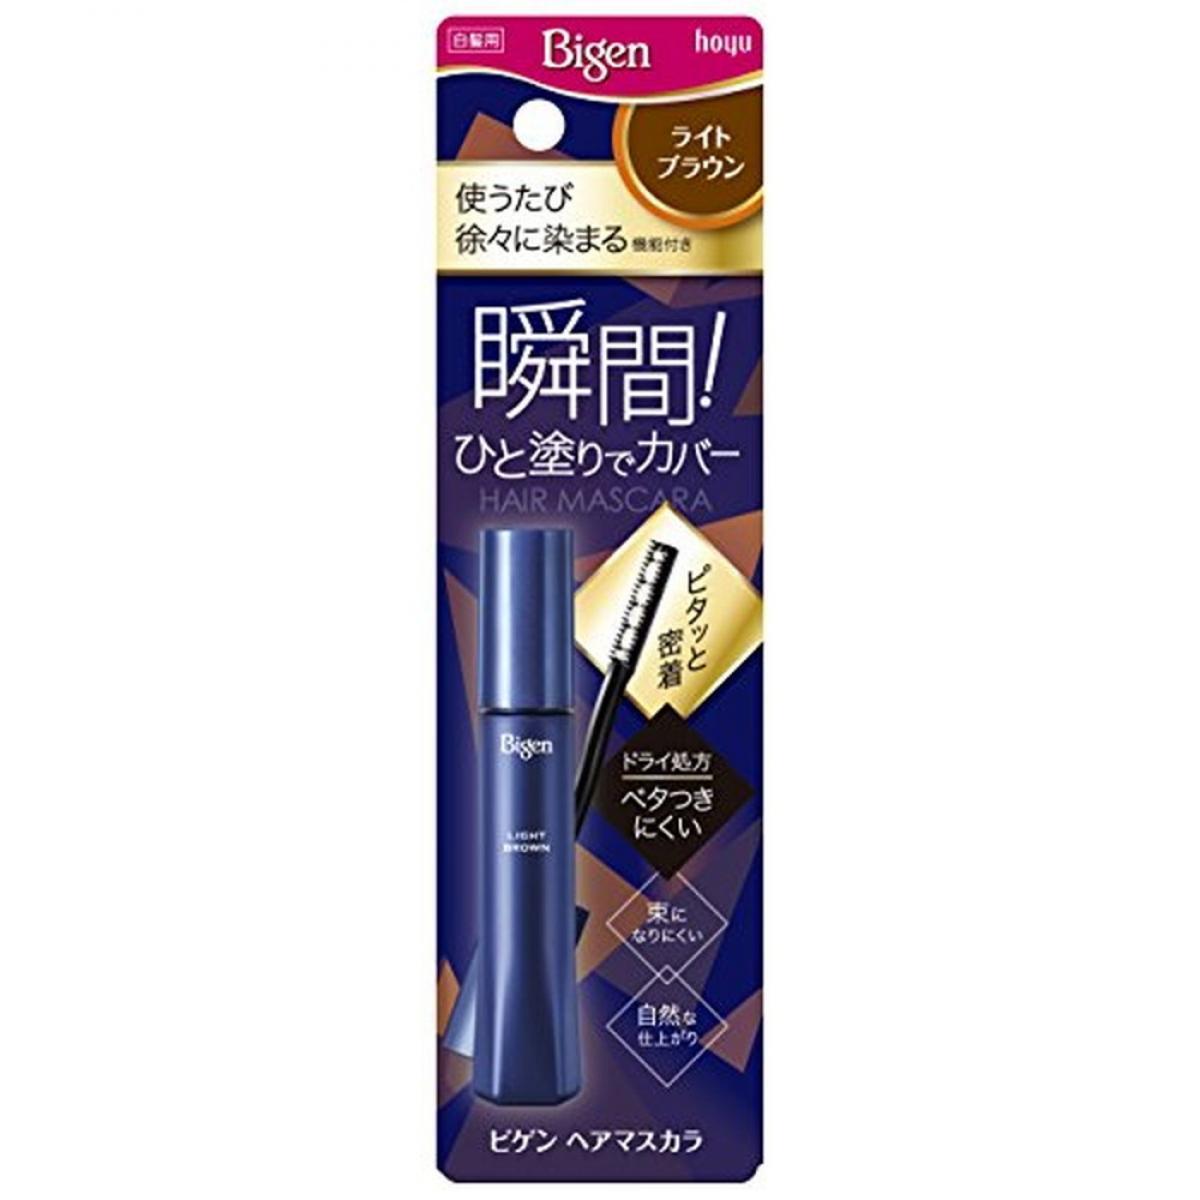 DIY・工具, その他  15ml